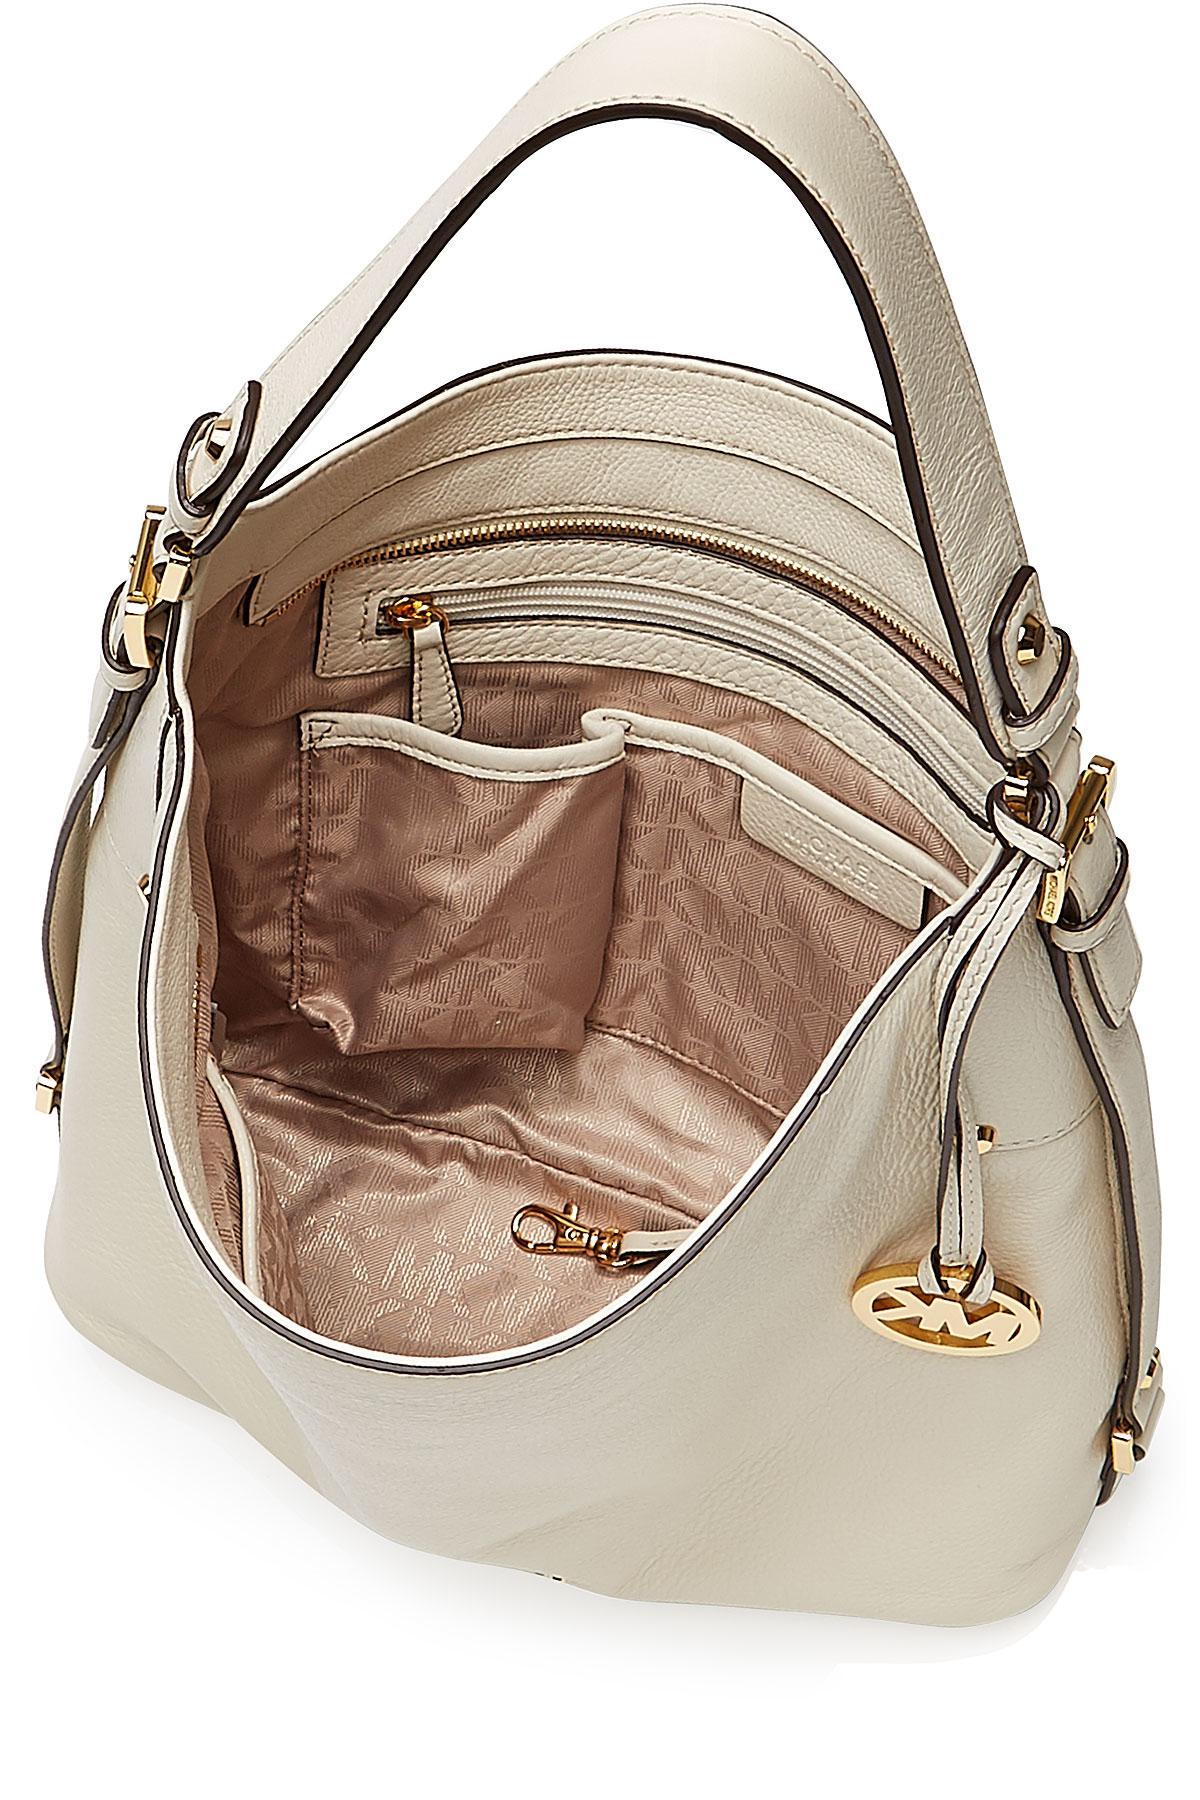 e86d22e55be9 ... shopping lyst michael michael kors bedford large leather shoulder bag  da1cf 02ac8